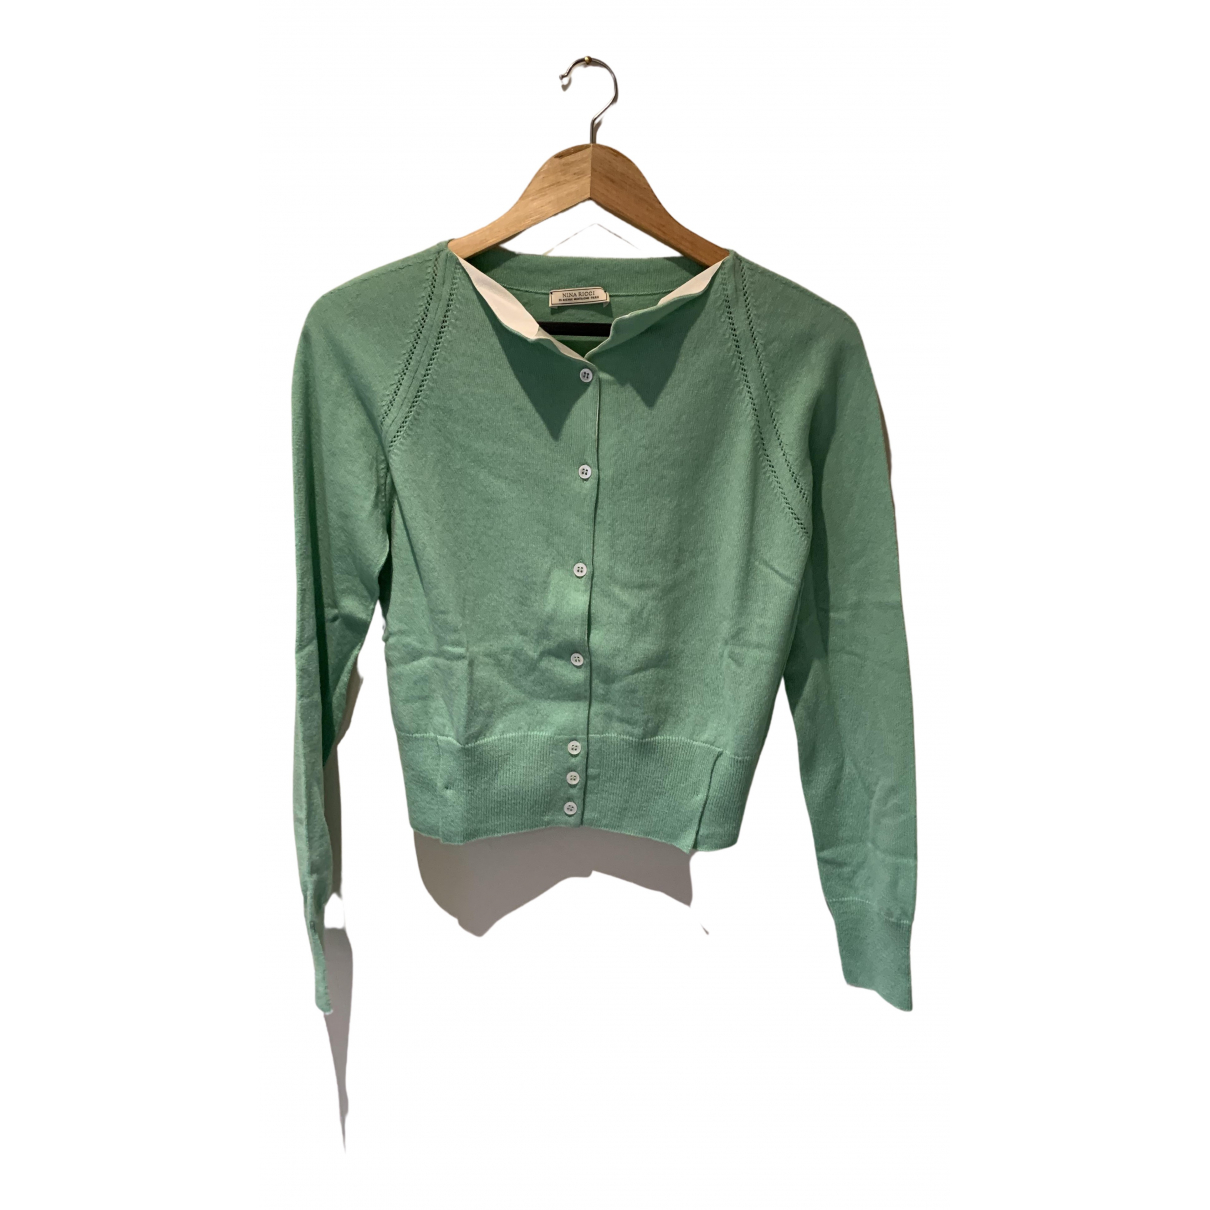 Nina Ricci - Pull   pour femme en cachemire - vert